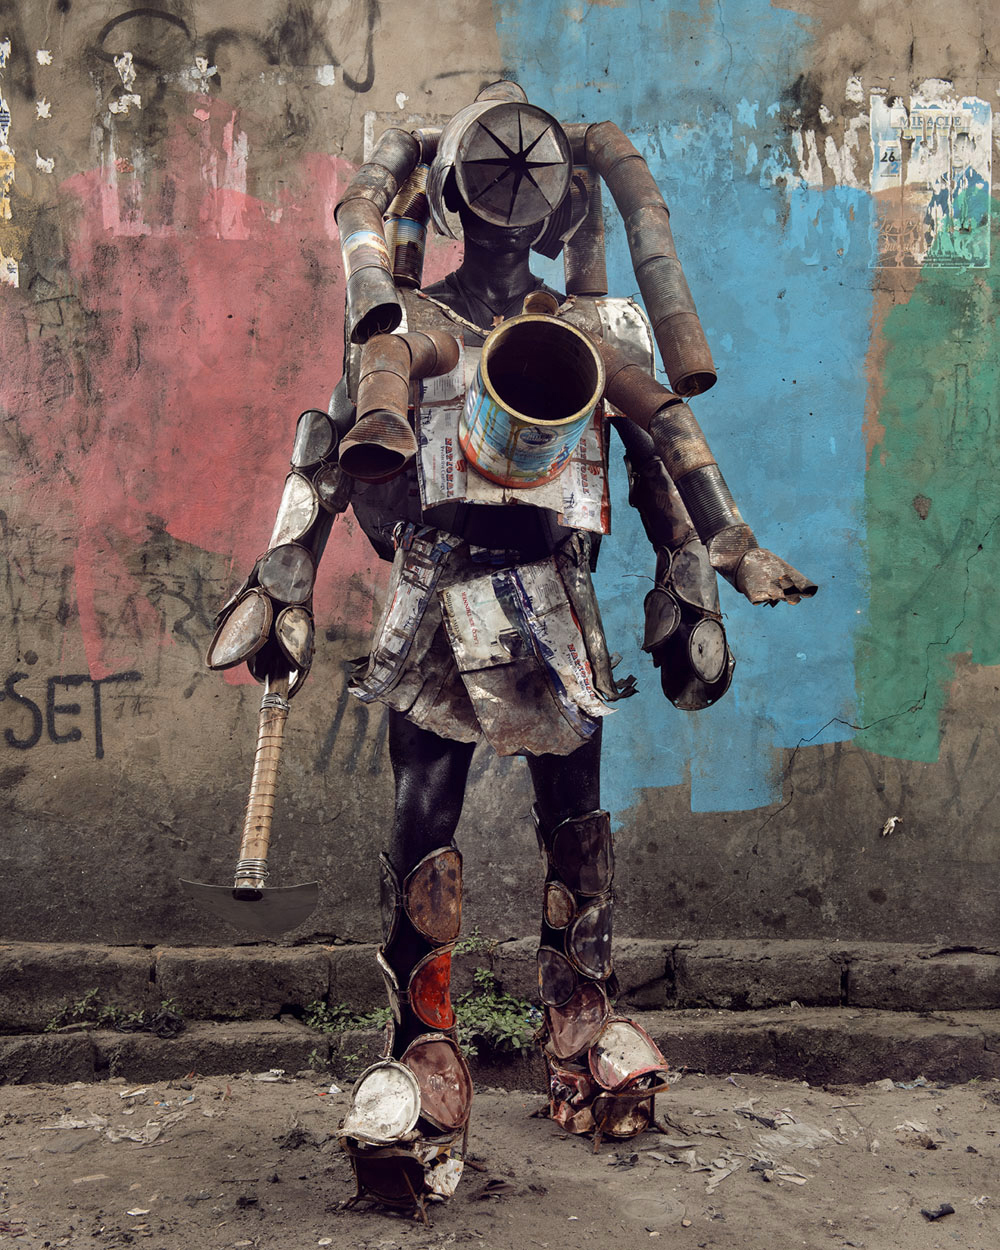 Untitled #22, 2020 Homo Detritus, Real Portraitik #5 Kinshasa, RDC ©Stephan Gladieu